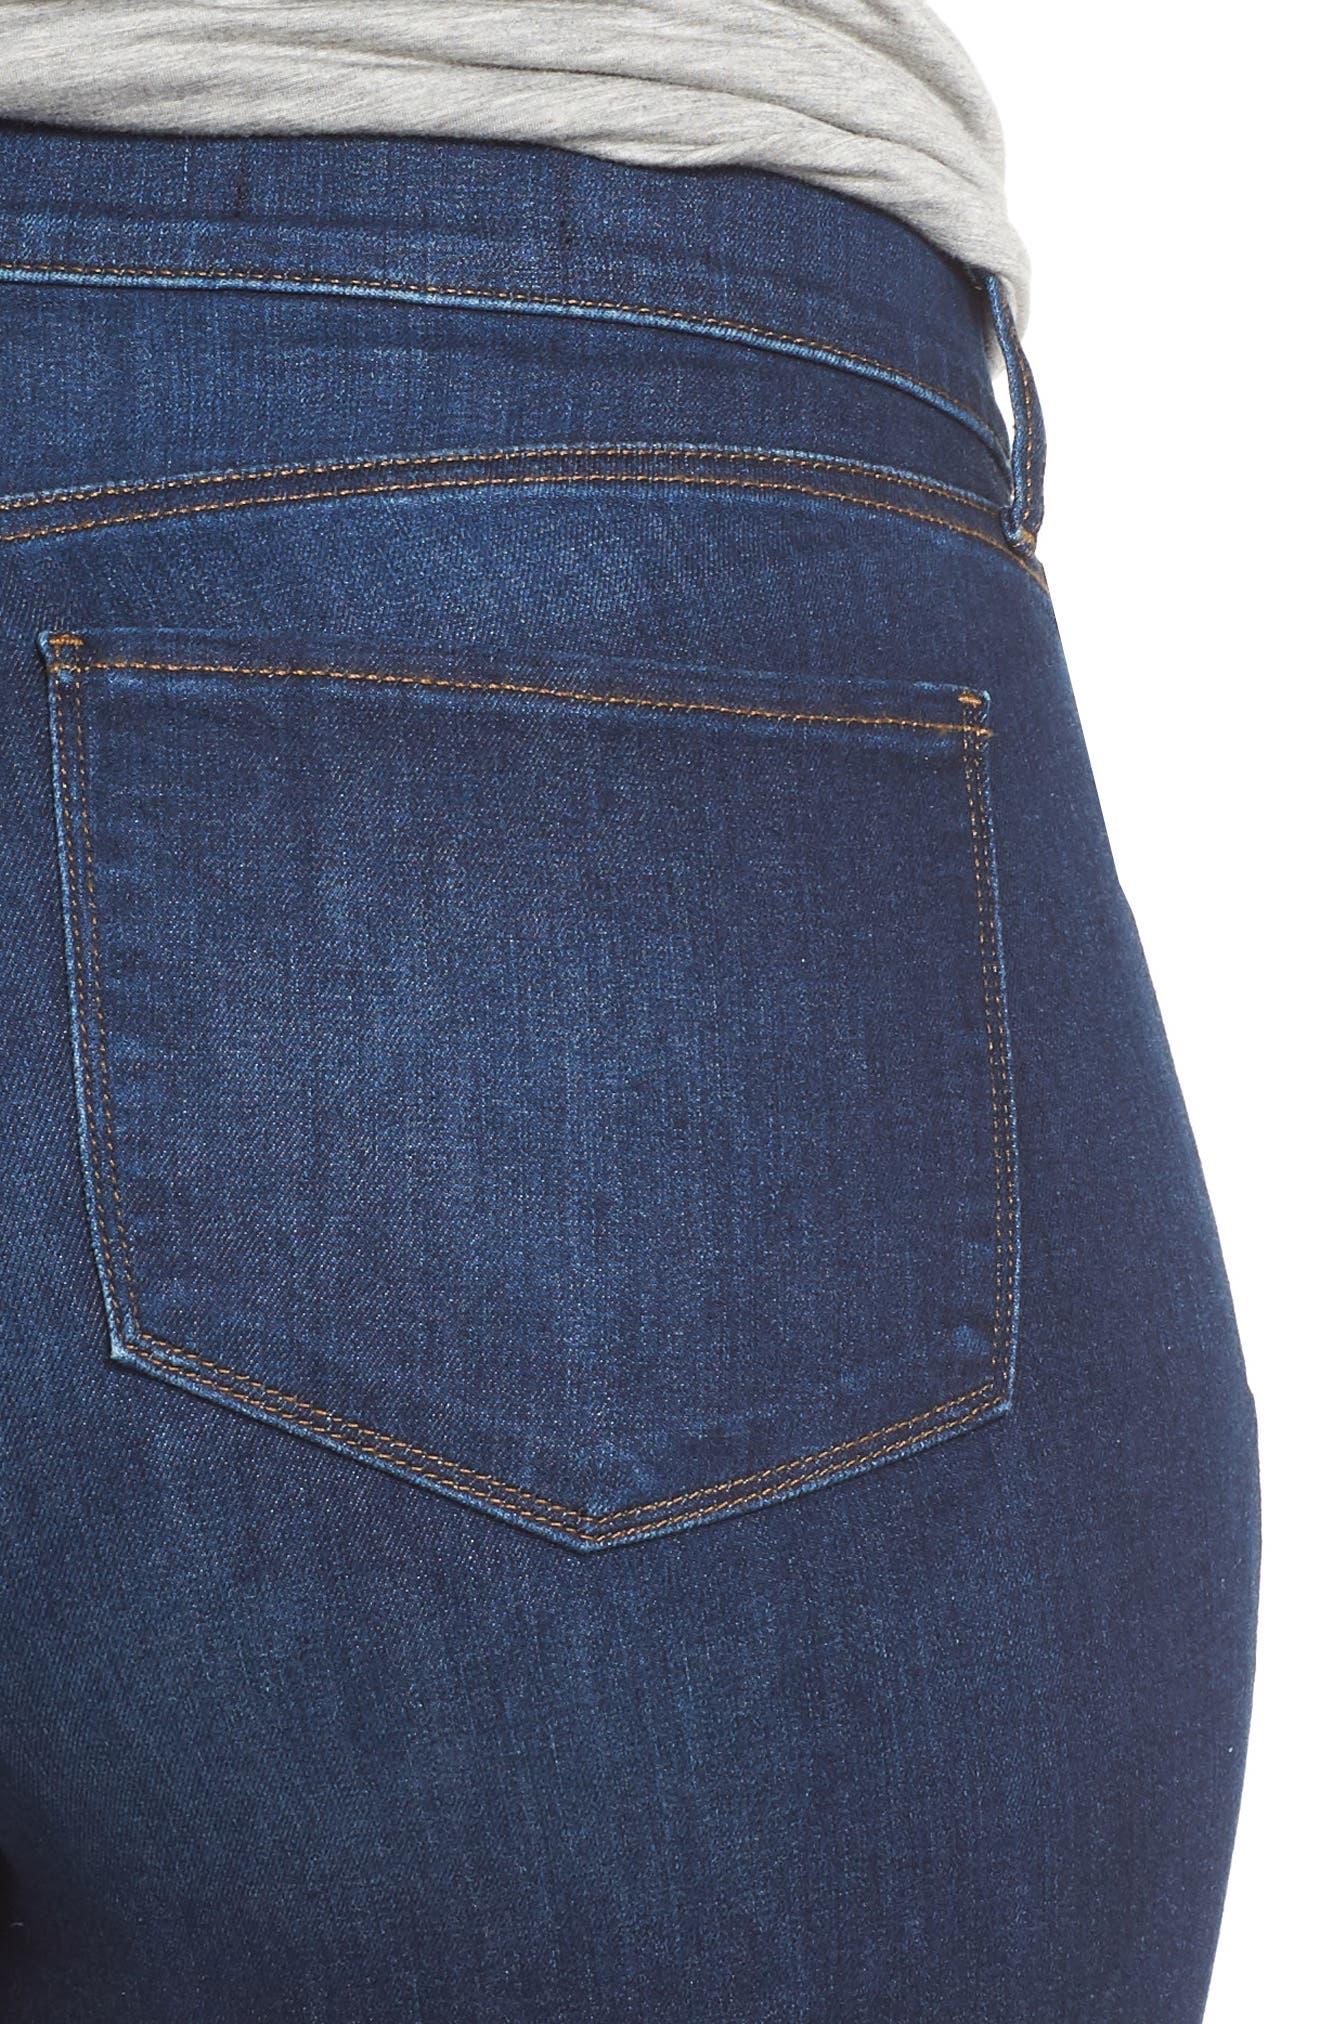 Briella Fray Hem Denim Bermuda Shorts,                             Alternate thumbnail 6, color,                             Cooper